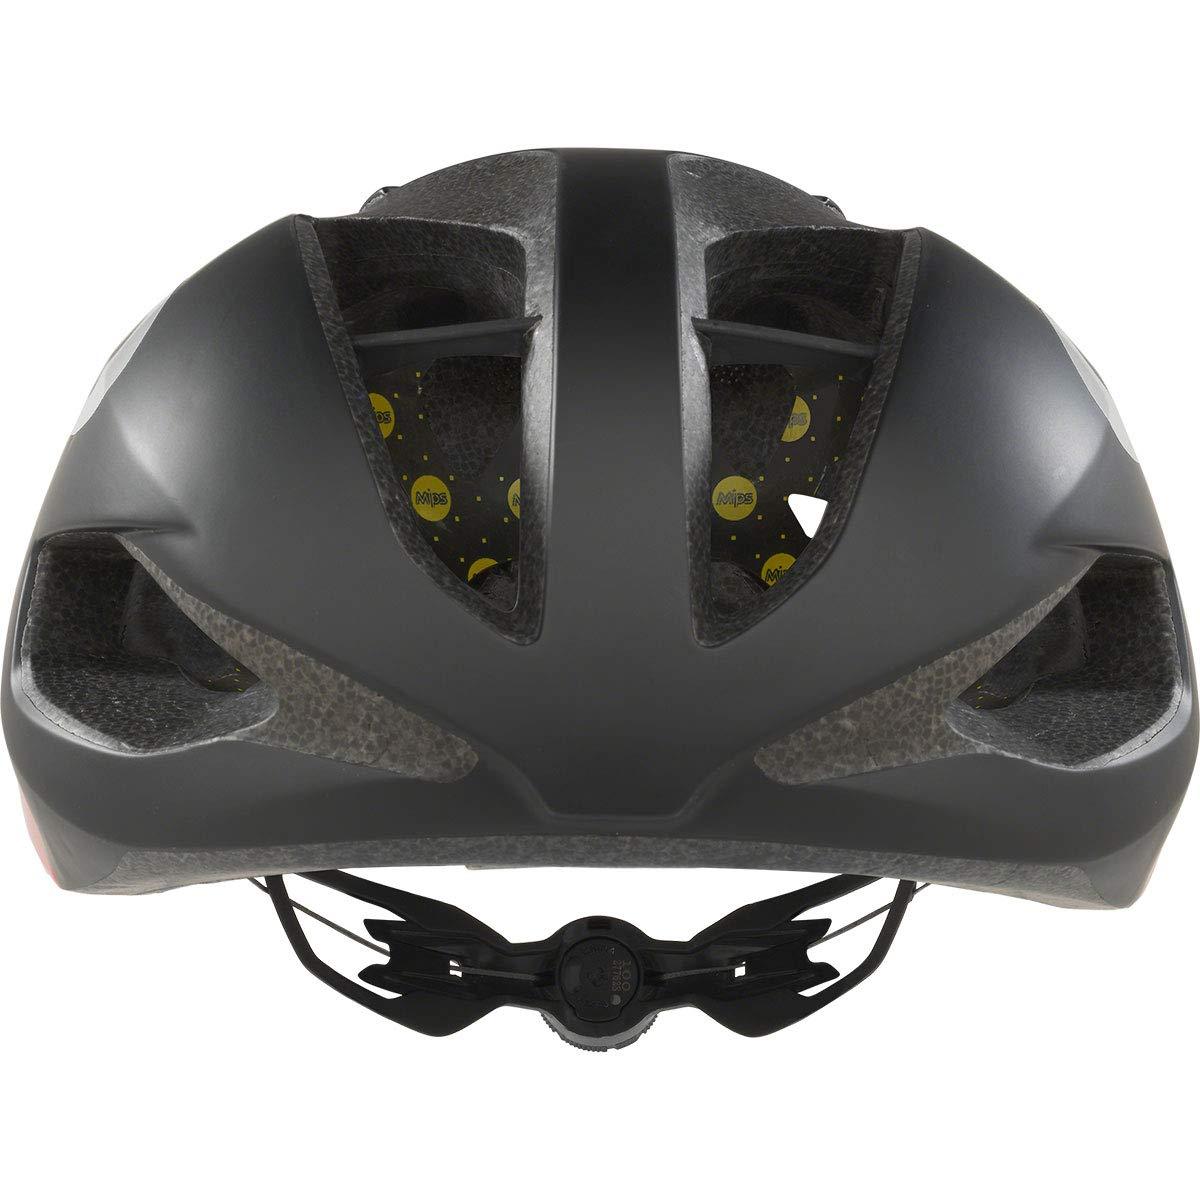 b163096cb06 Amazon.com   Oakley ARO5 Men s MTB Cycling Helmet   Sports   Outdoors